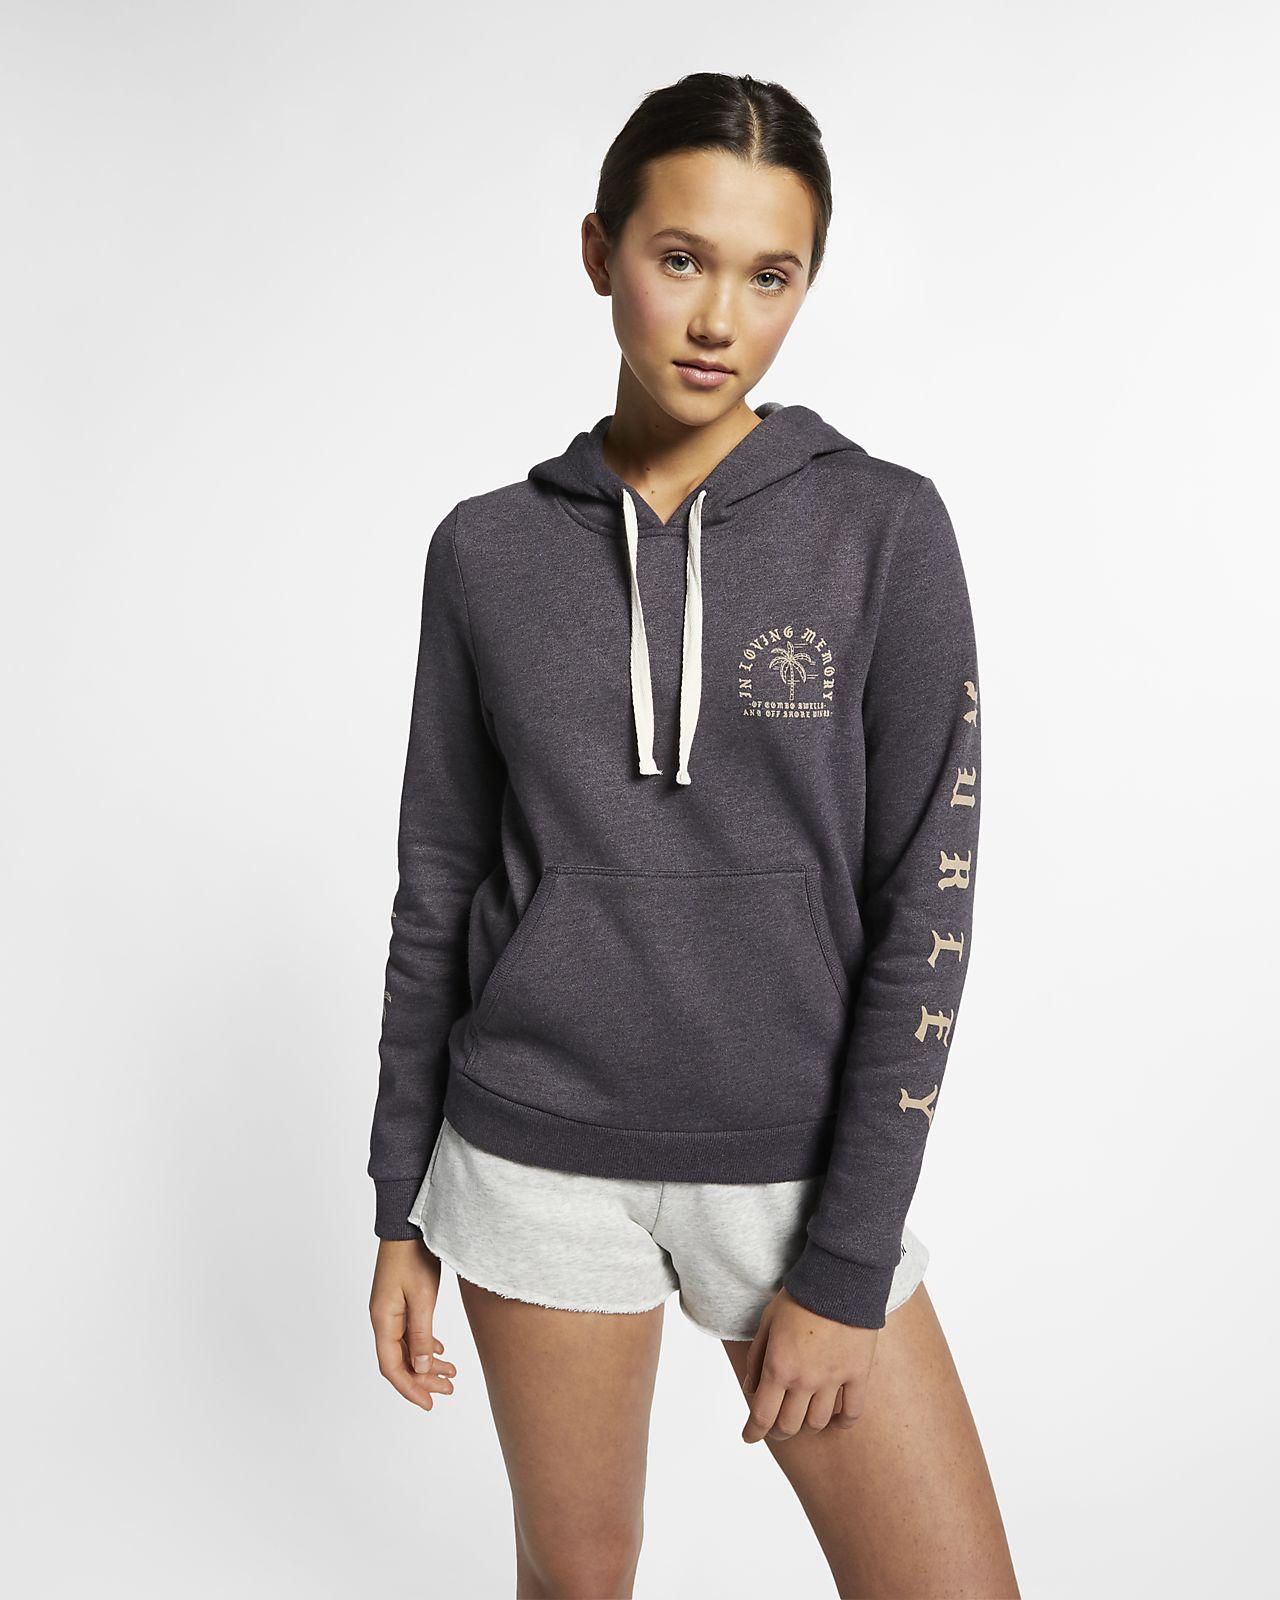 Hoodie pullover de velo Hurley Combo Swells para mulher